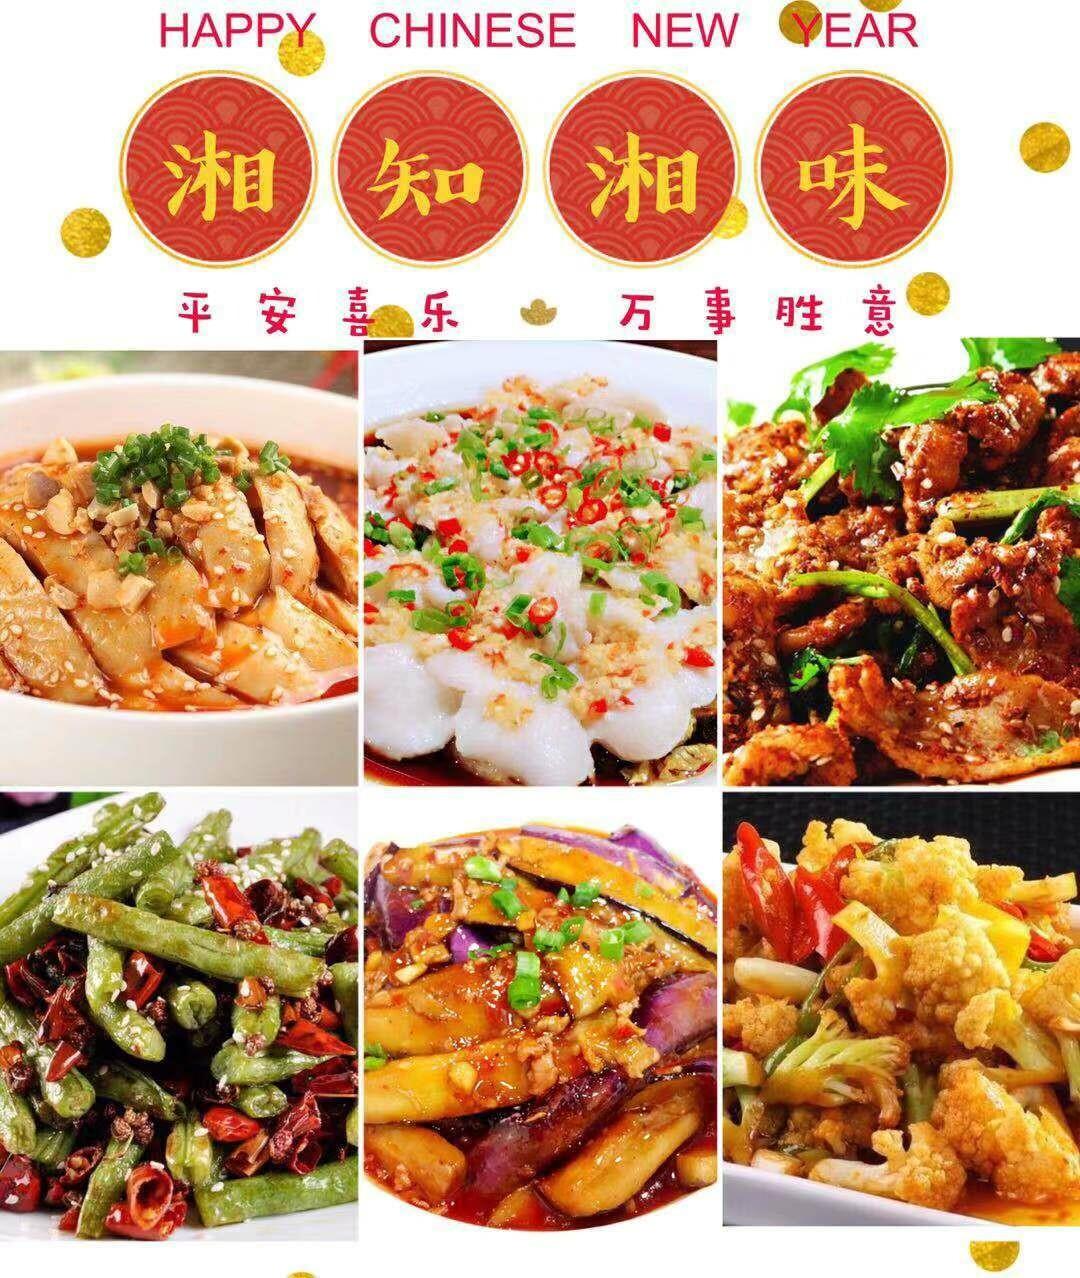 XZXW【湘知湘味】超值吃货$40套餐